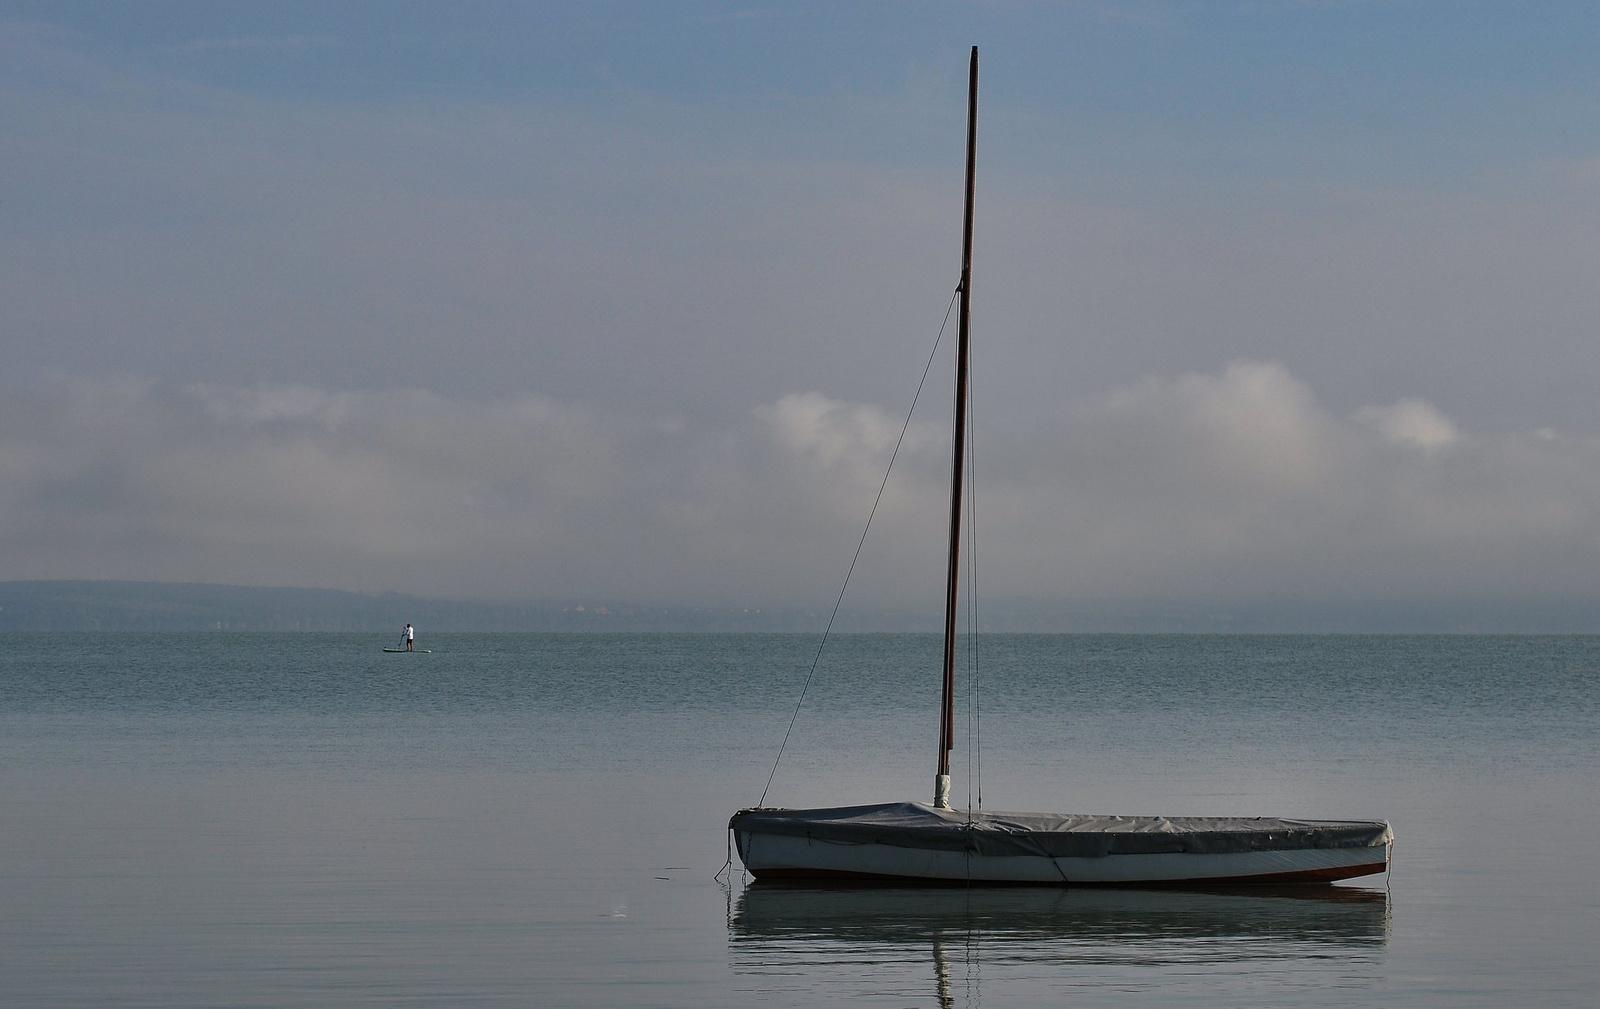 Merengés a parton reggel